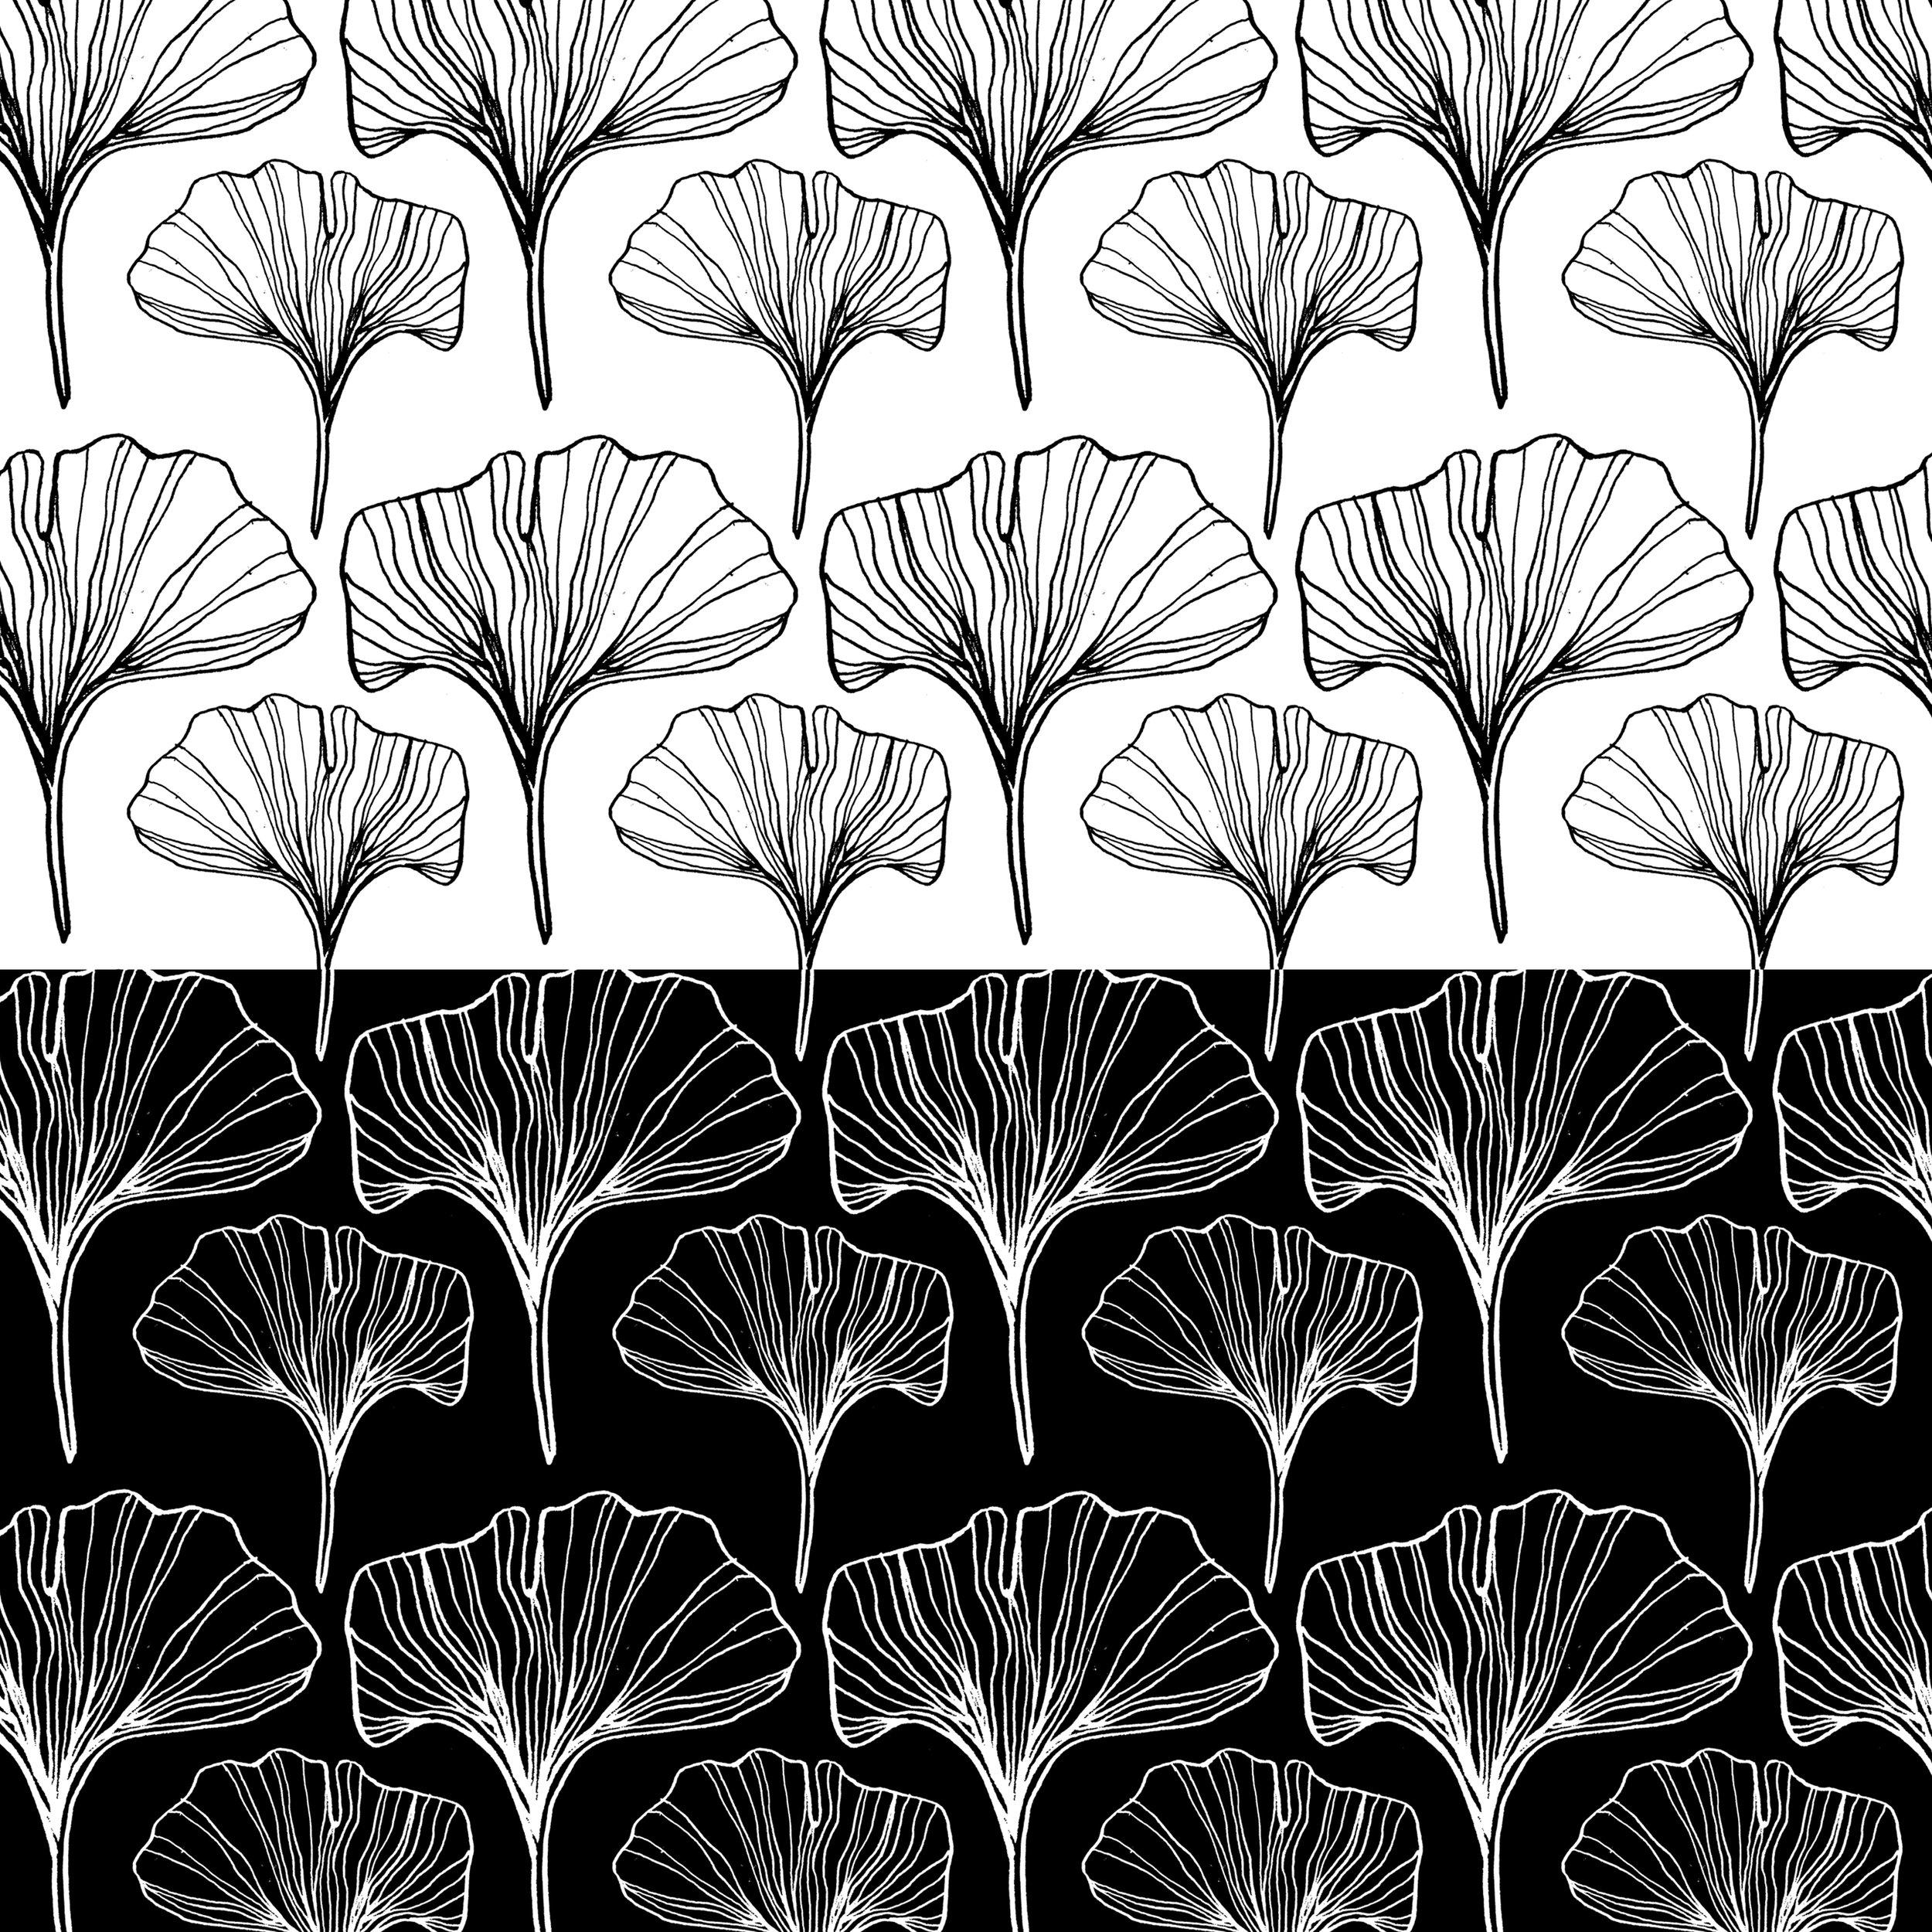 Fabric_Sample_Gingko_BW.jpg